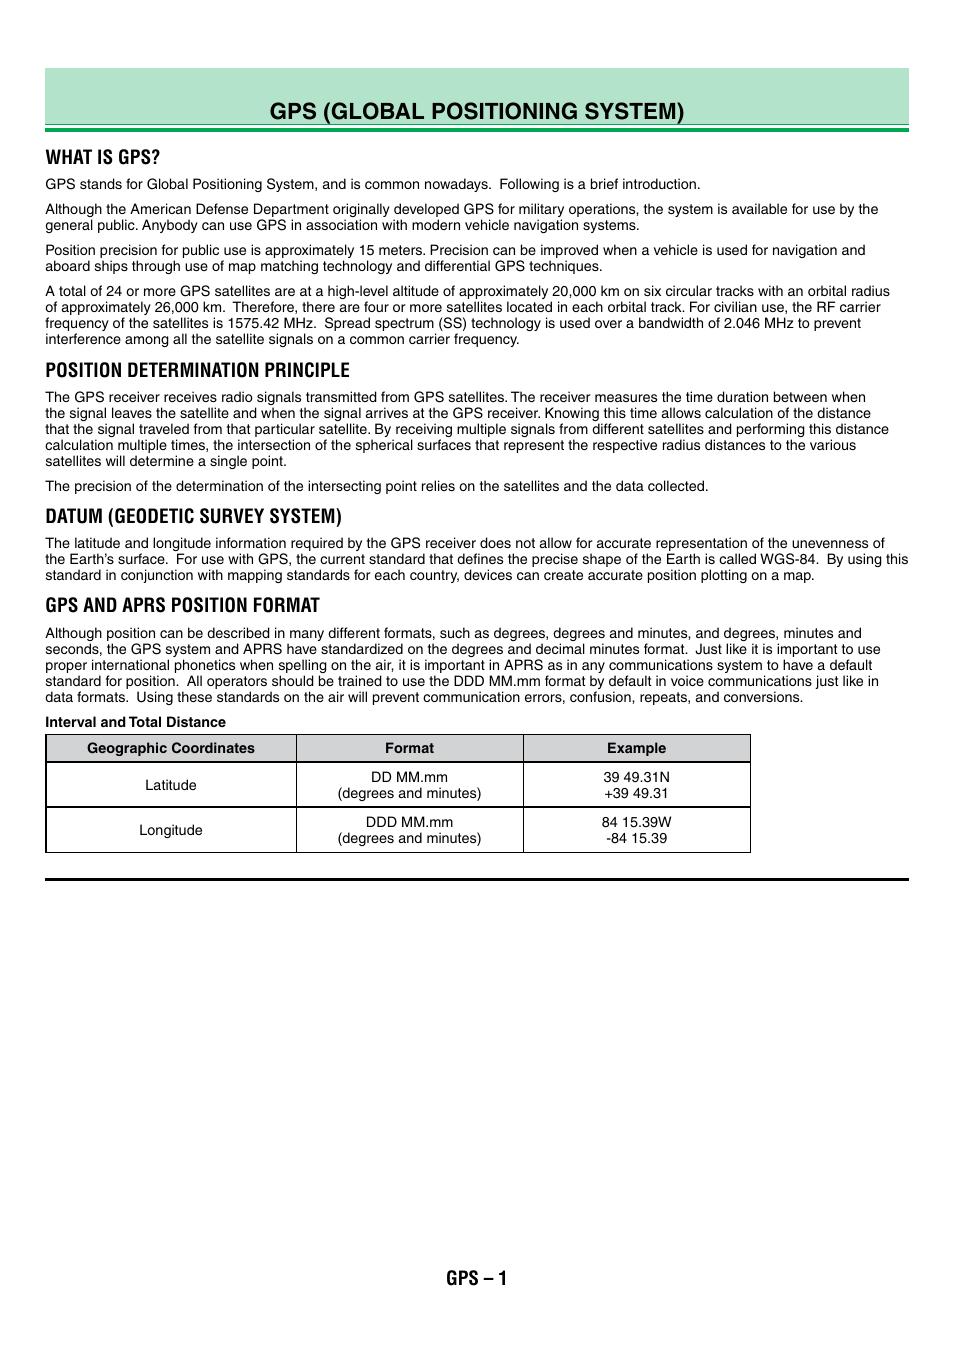 Tm-d710g_09_gps_en, Gps (global positioning system), What is gps | Position